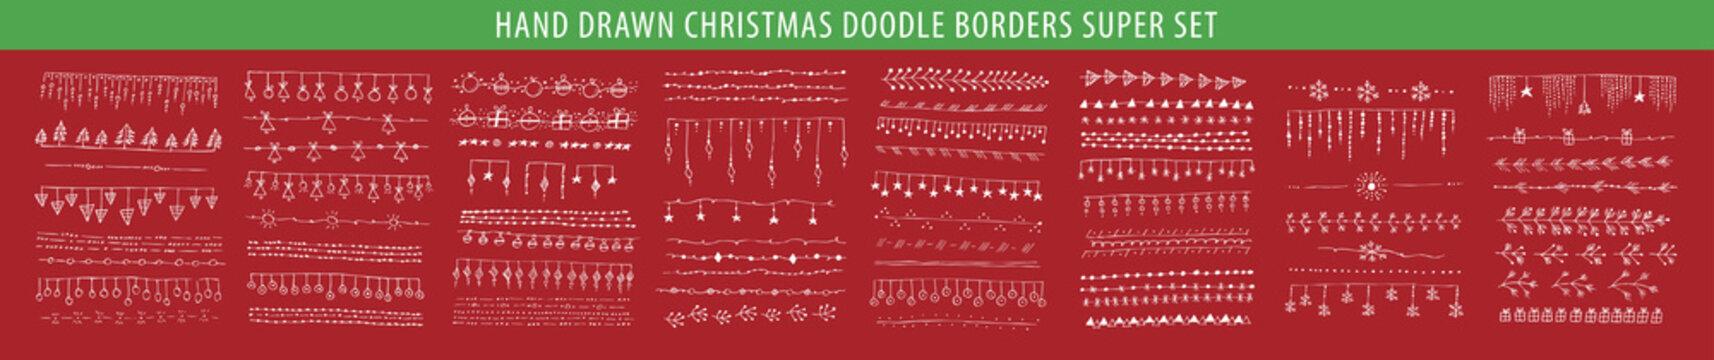 Hand drawn Christmas line, border, frame vector doodle design element set. Template for invitation or greeting card.